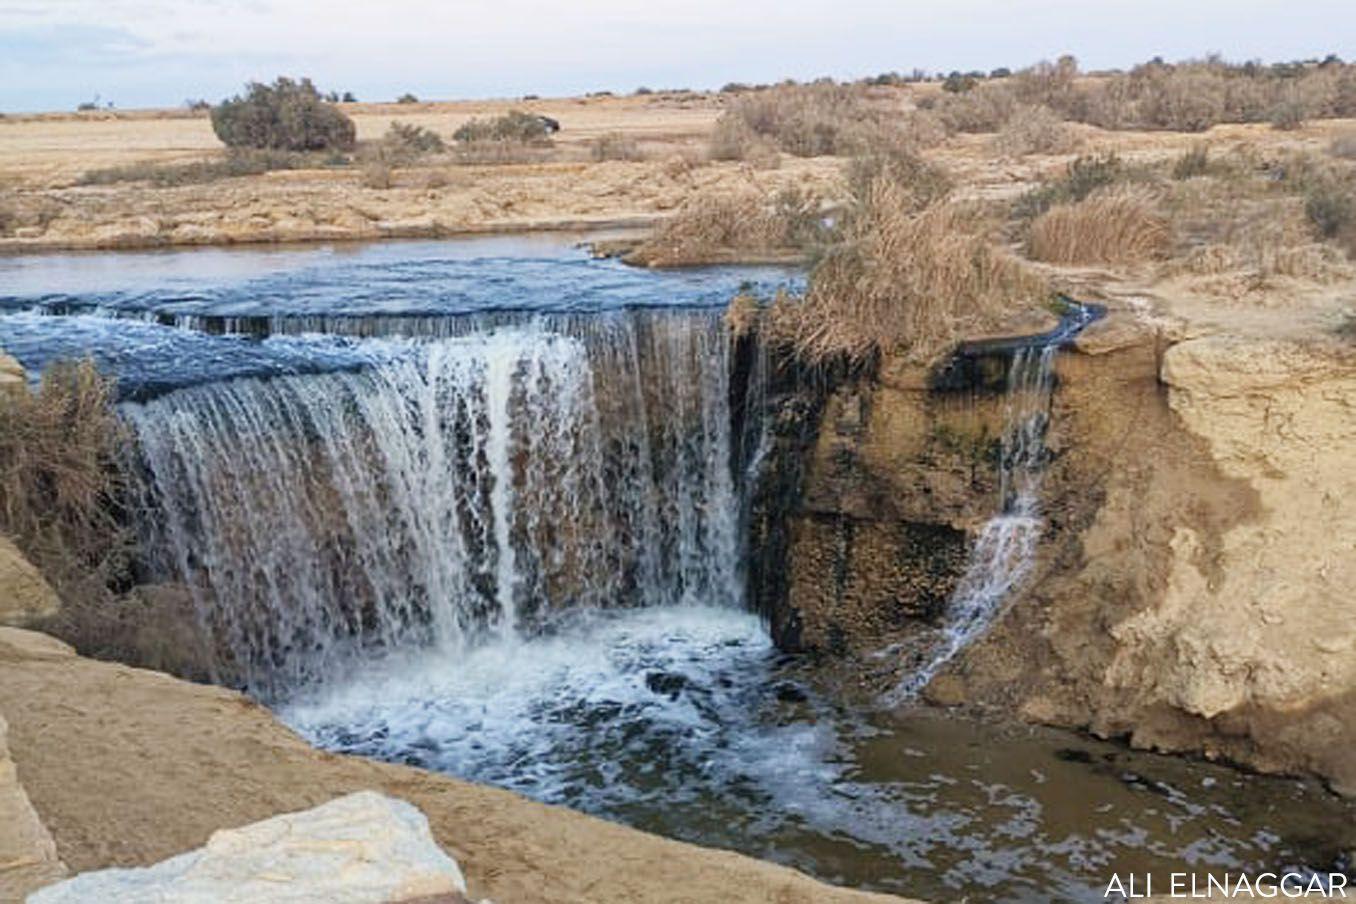 Wadi Elrayan